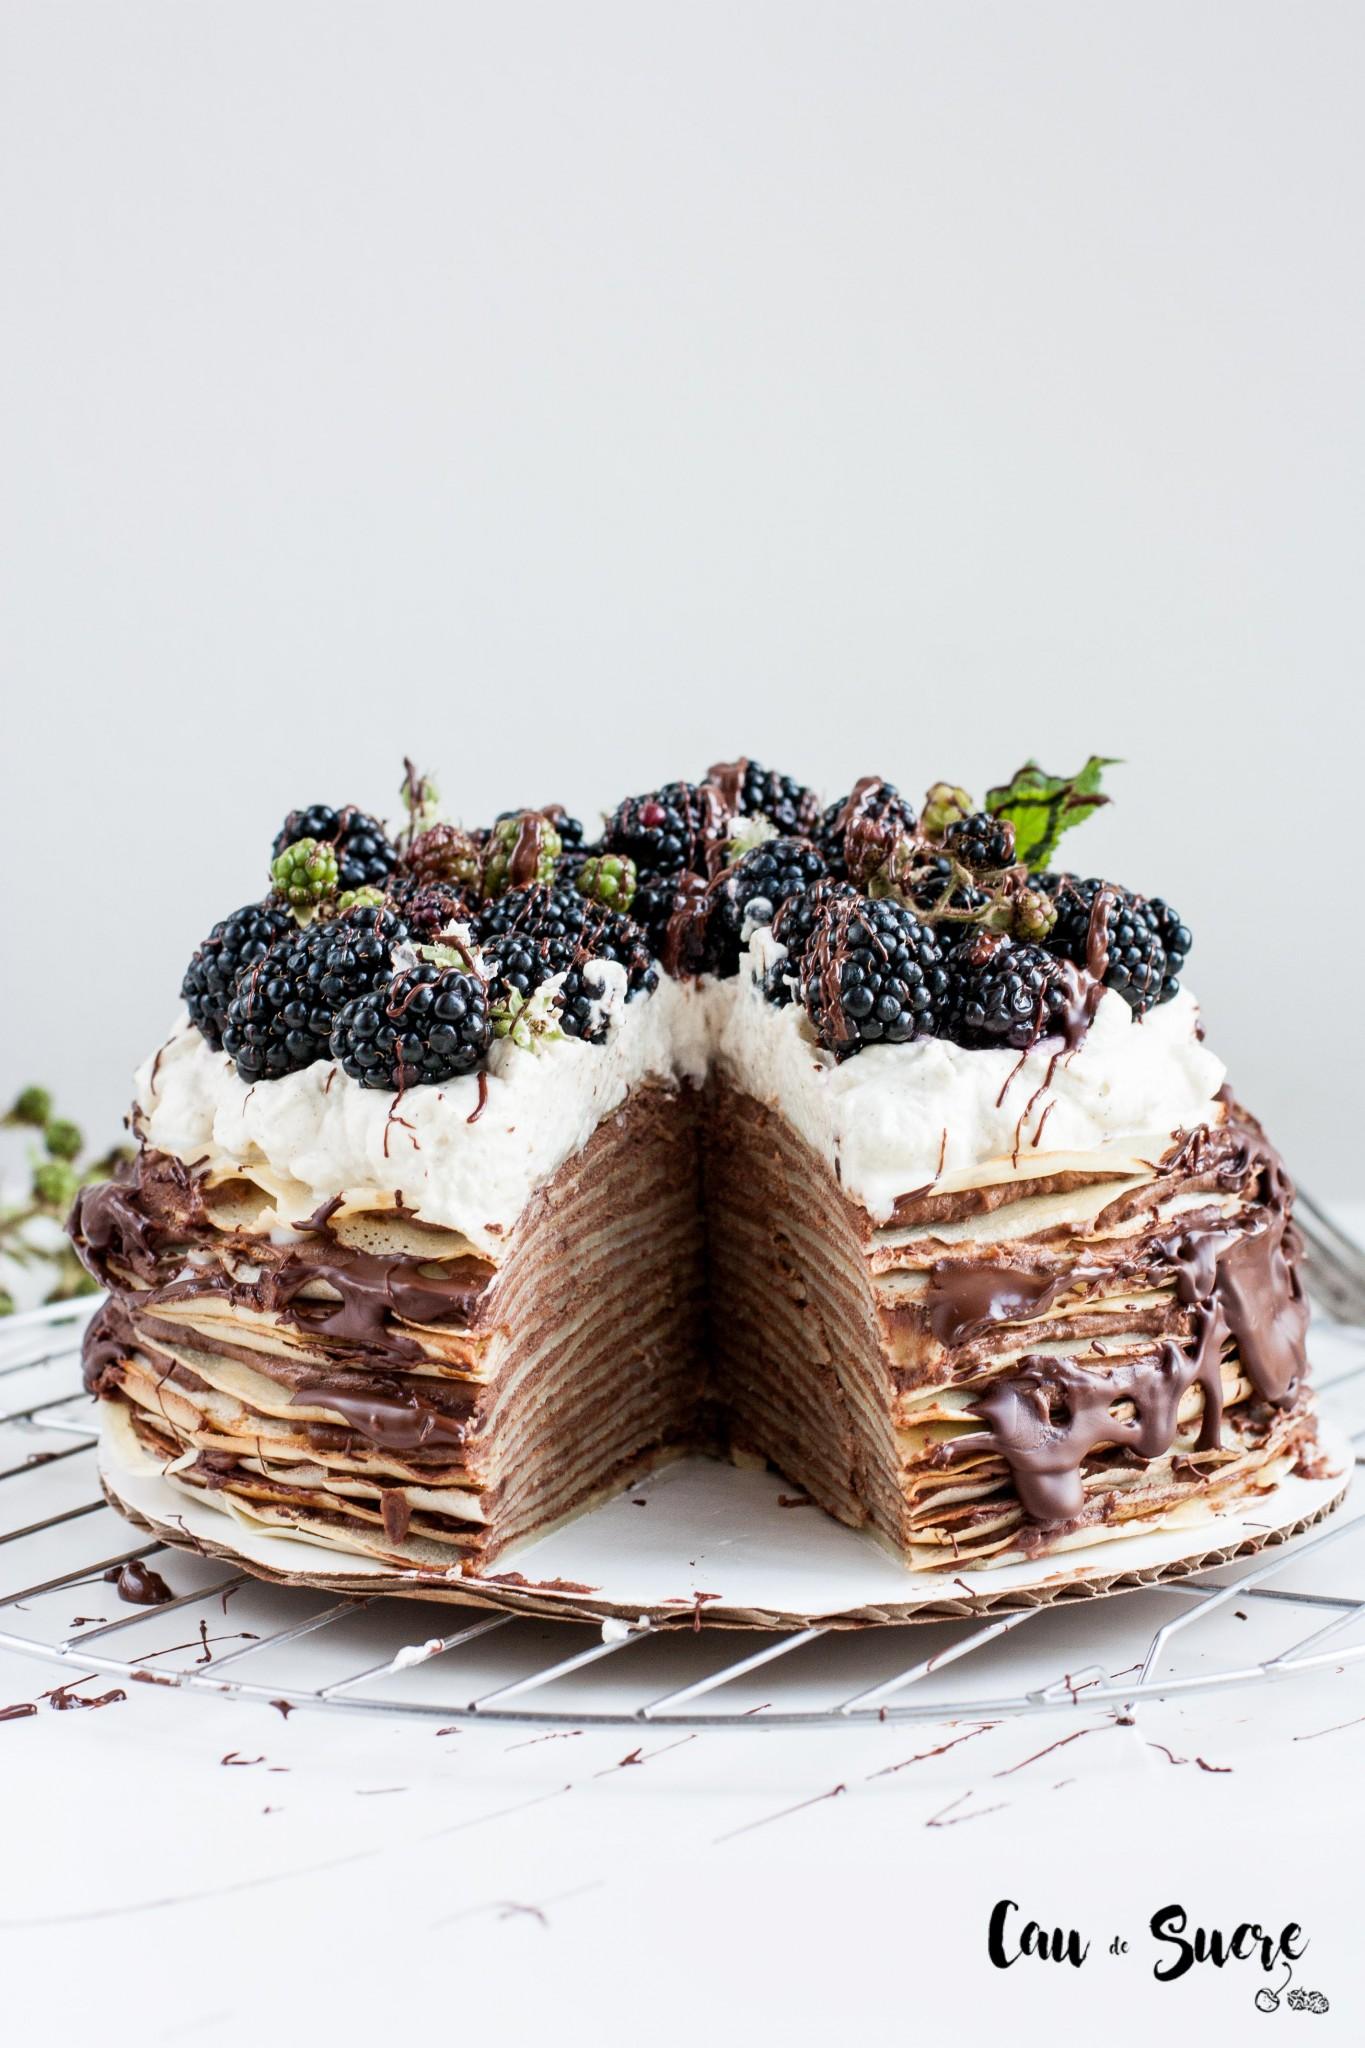 épica Tarta Mil Crepes De Chocolate Y Moras Cau De Sucre